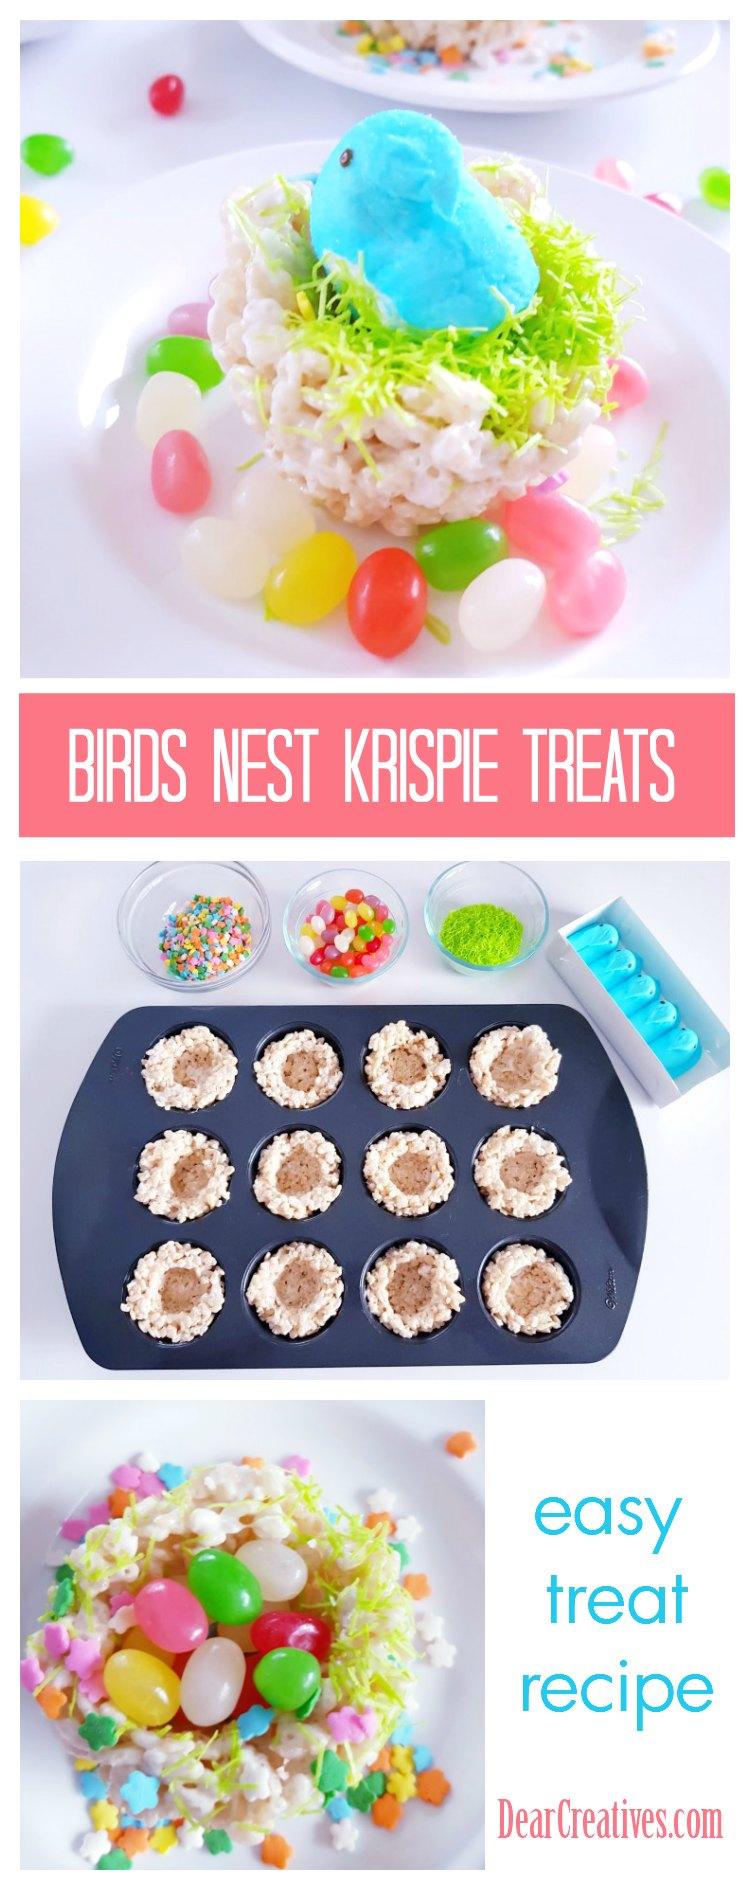 Birds nest krispie treats   This is a fun and easy no bake treat bonus, grab a discount for your candies. DearCreatives.com #treats #birdsnestcookies #birdsnestkrispietreats #PEEPSONALITY #sponsored